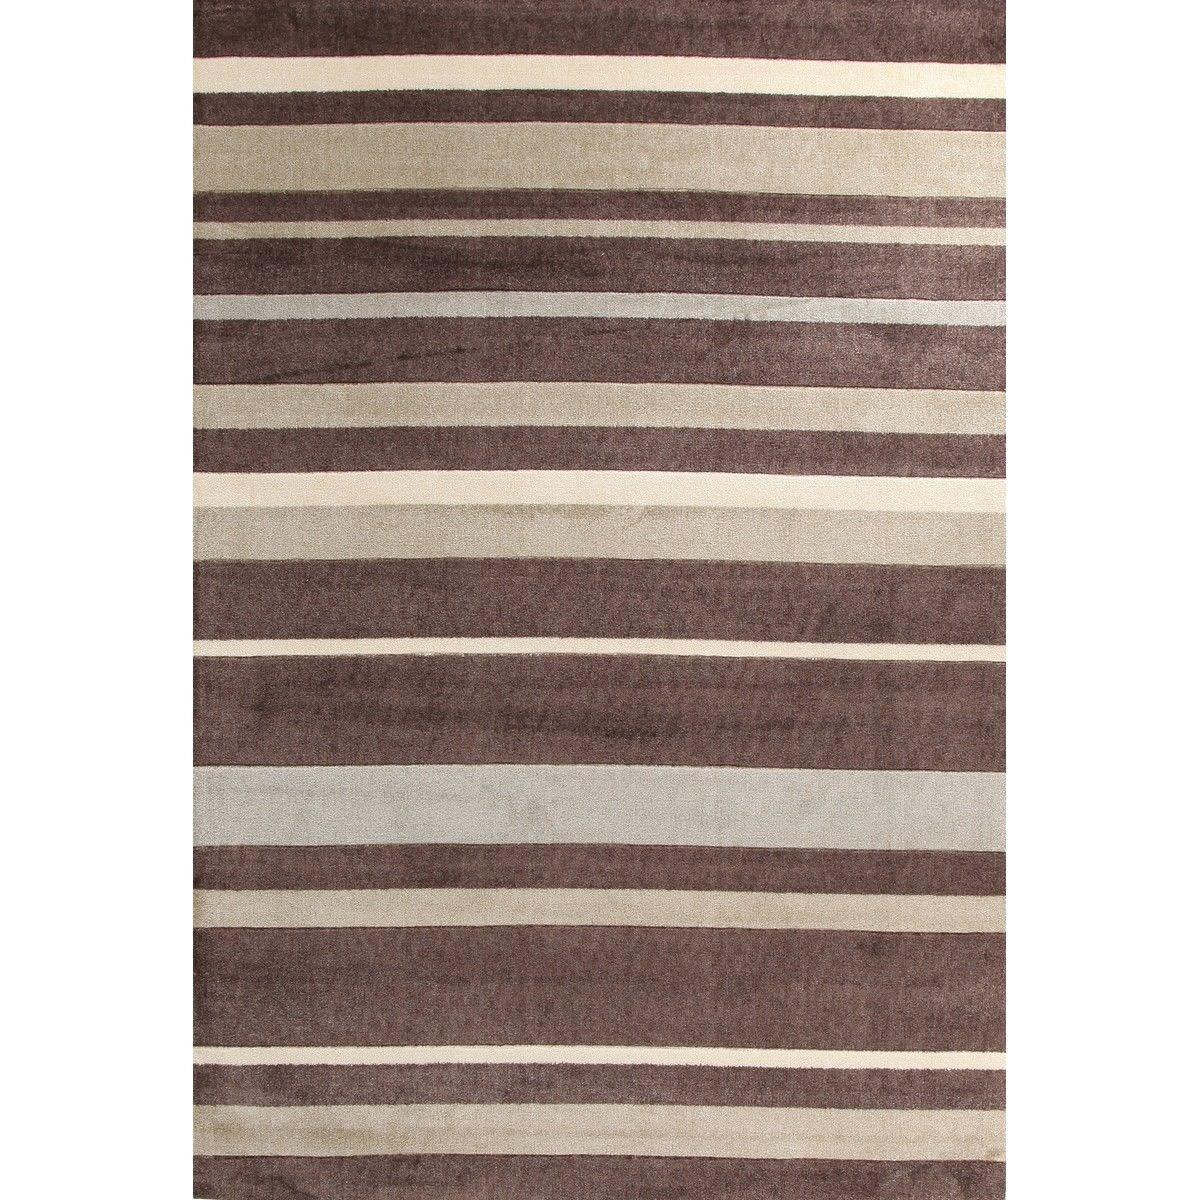 City Stylish Stripe Modern Rug, Beige 280x190cm, Brown / Taupe